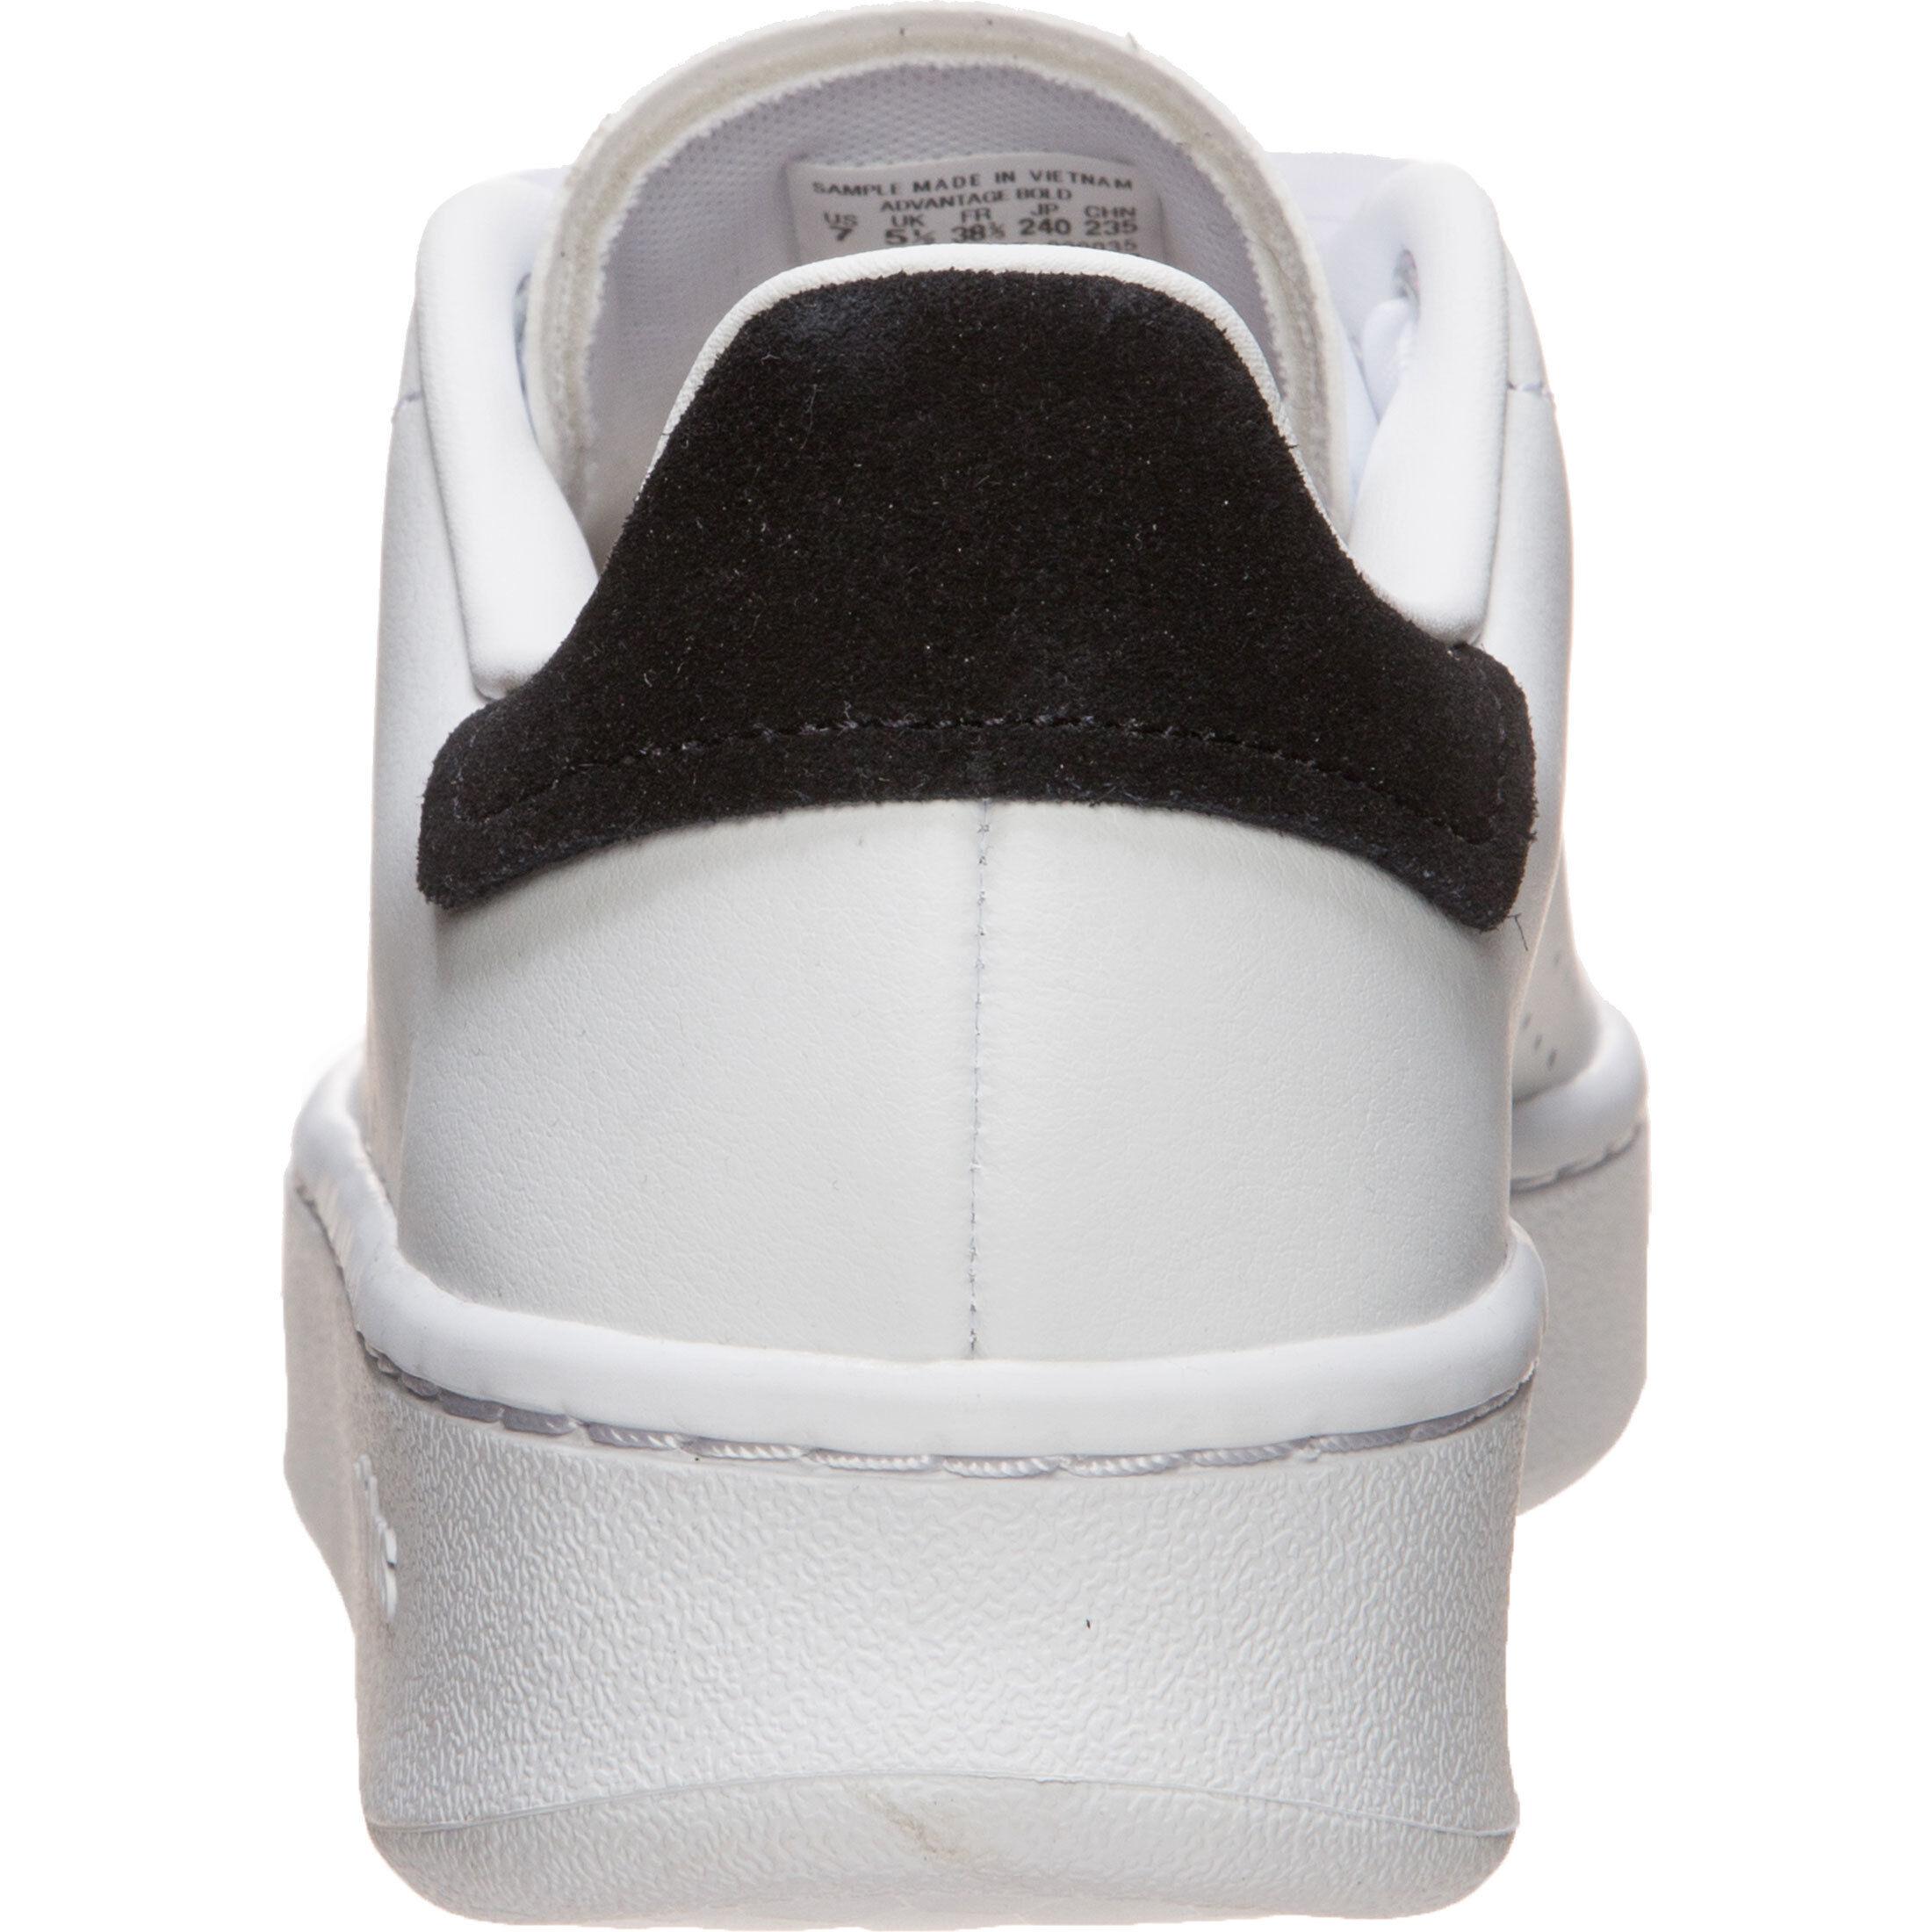 Damen Sneaker Outfitter Bold Bei Adidas Advantage rdQeWxCBo